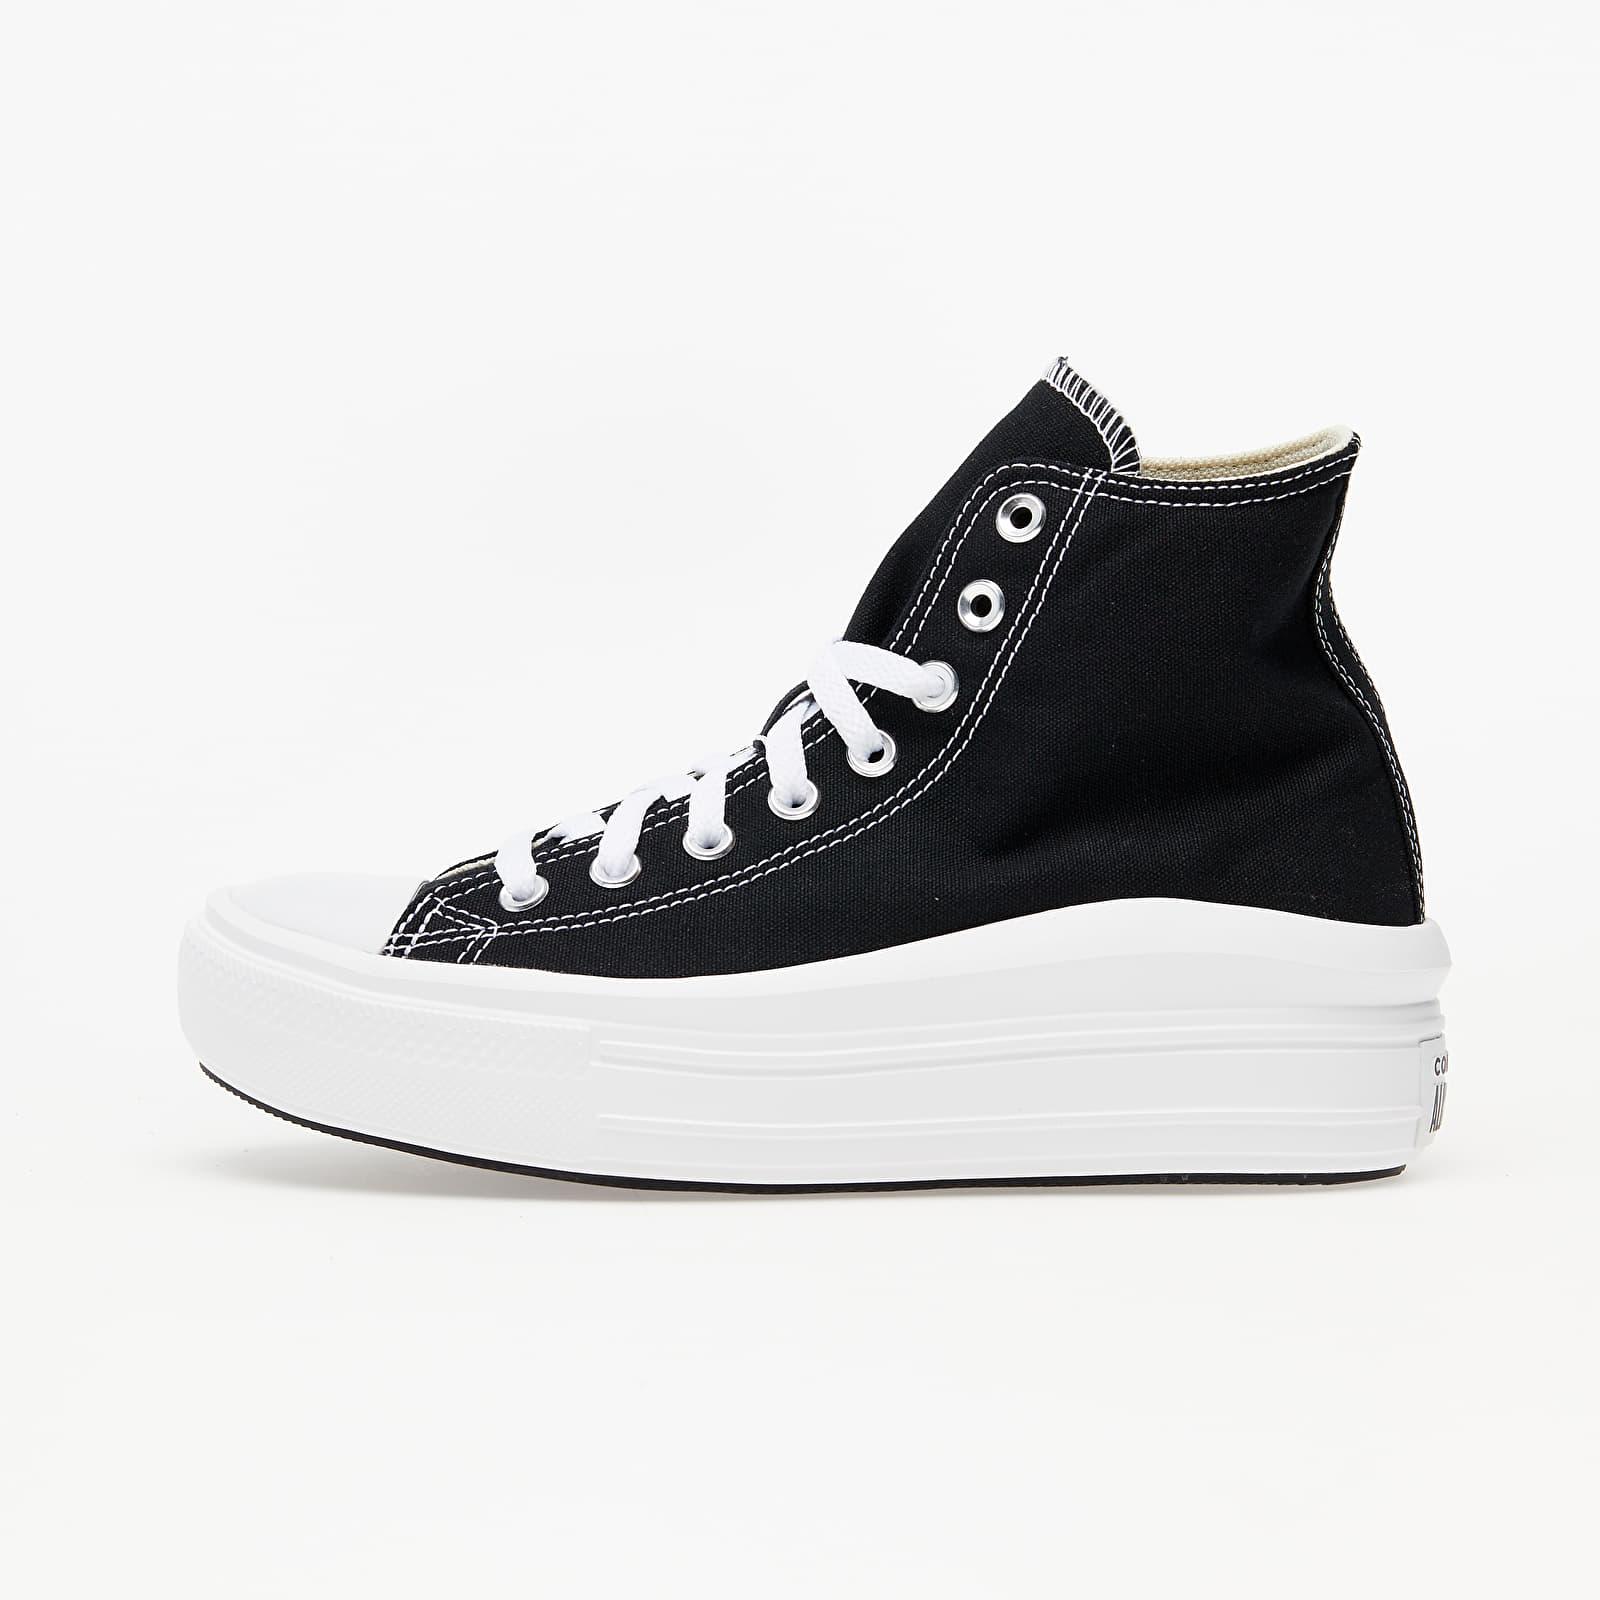 Женская обувь Converse Chuck Taylor All Star Move Black/ Natural Ivory/ White